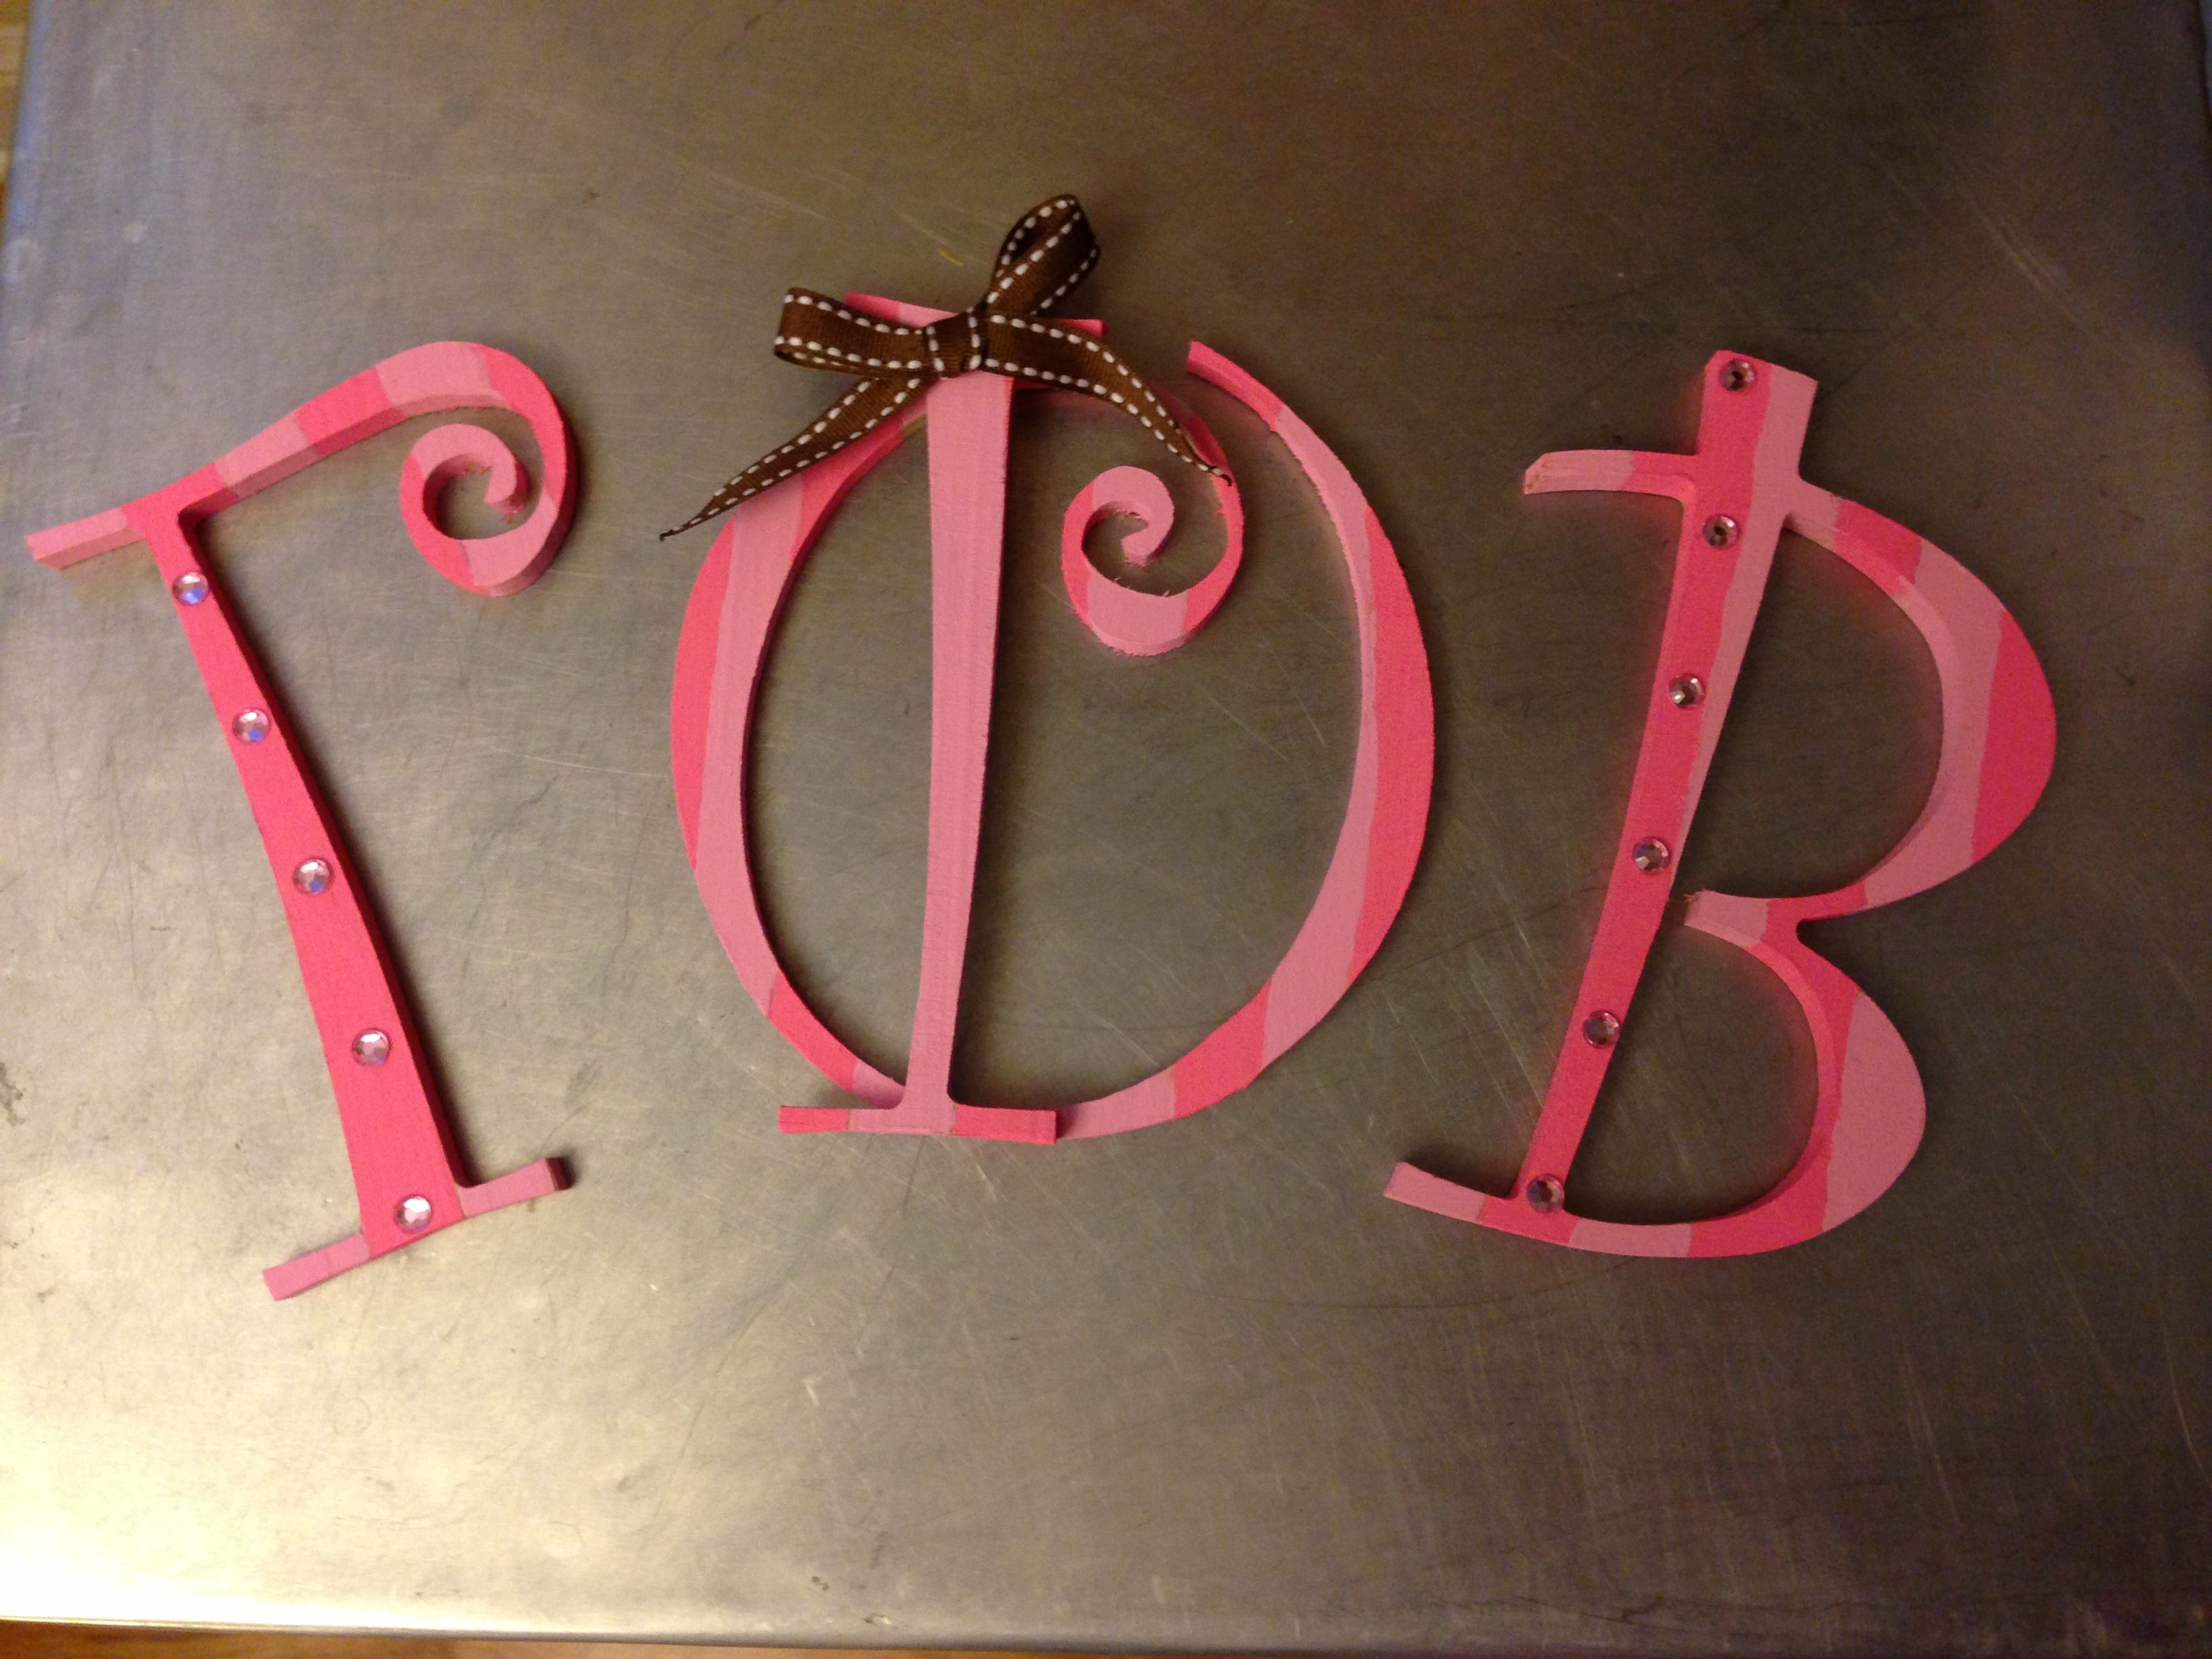 Victoria's Secret inspired! Gamma Phi Beta letters